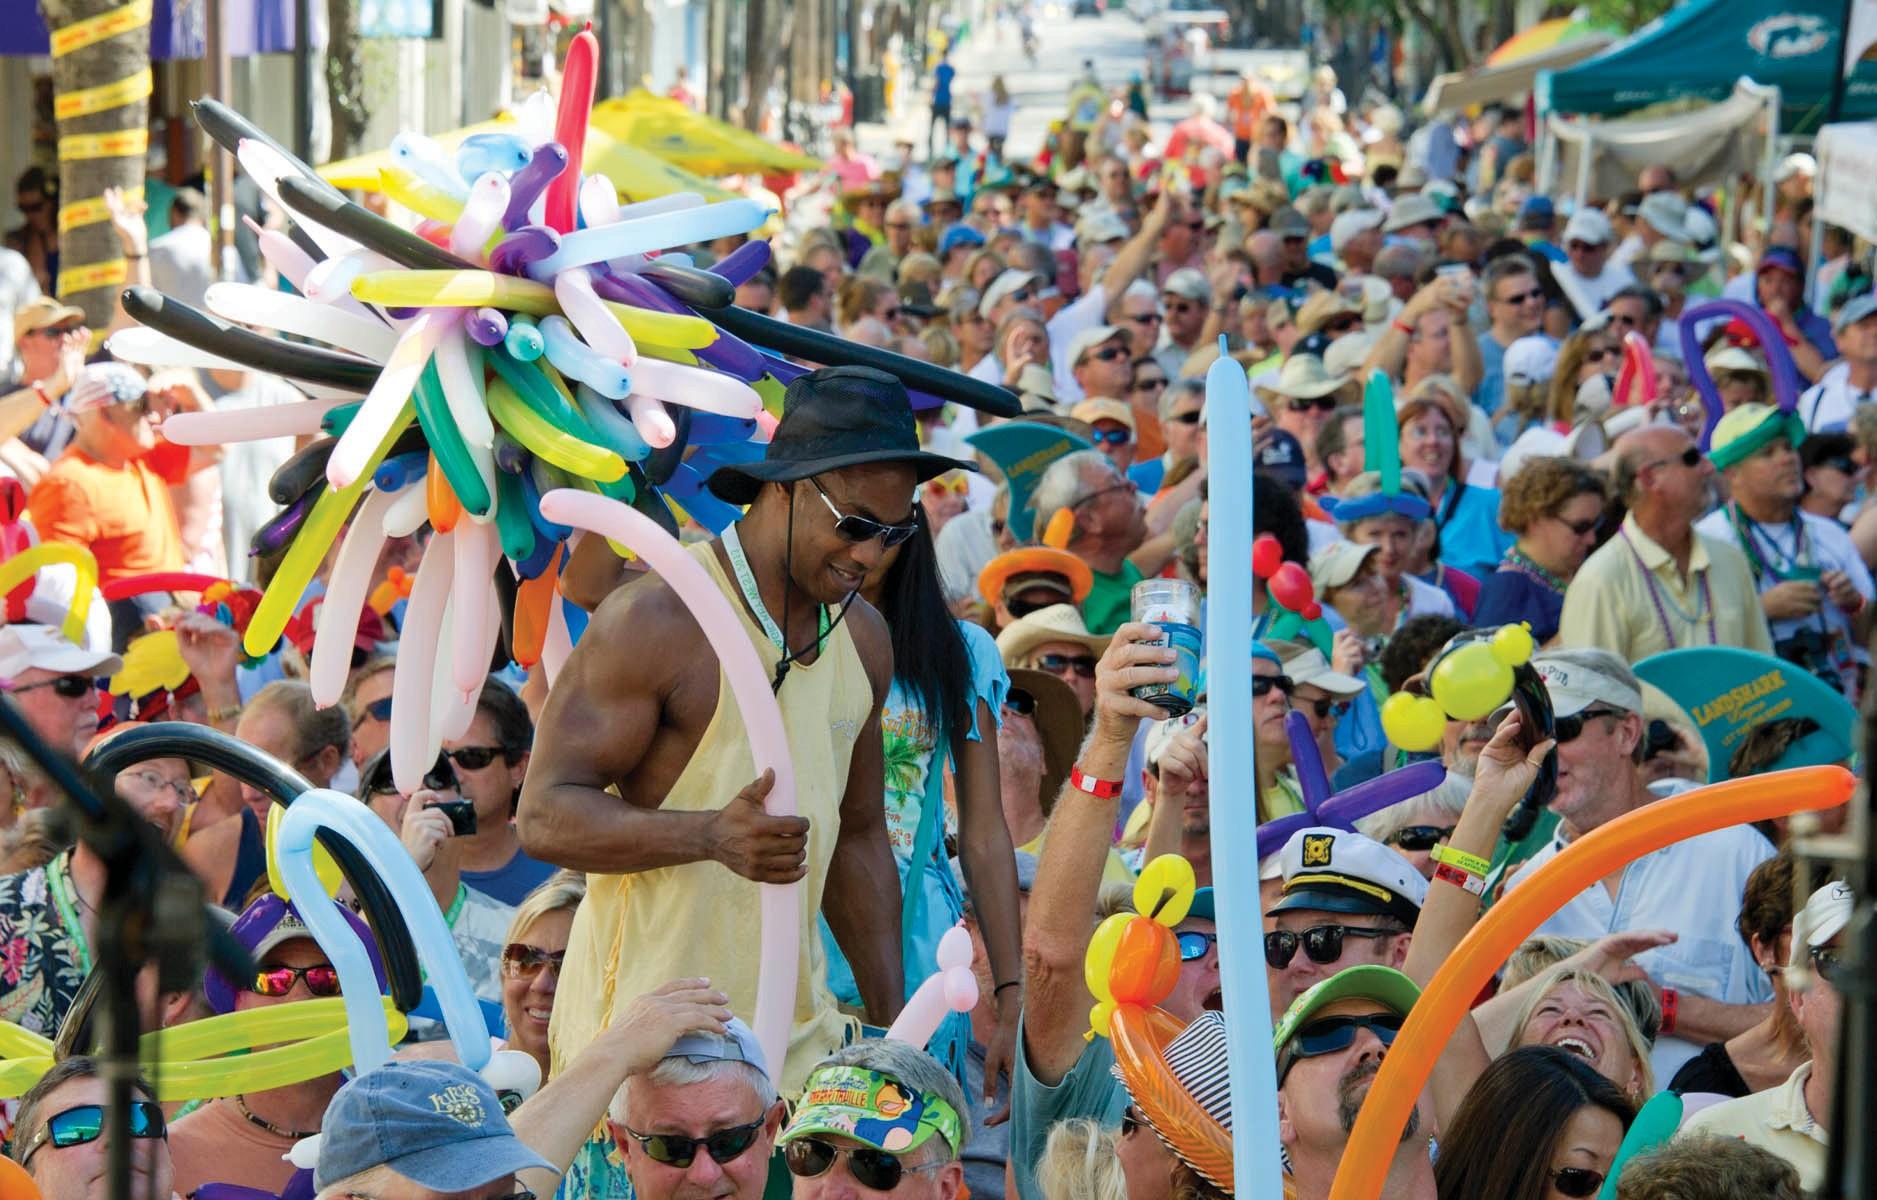 Parrot Head revelry on Duval Street. ANDREW TALBERT / COURTESY PHOTO